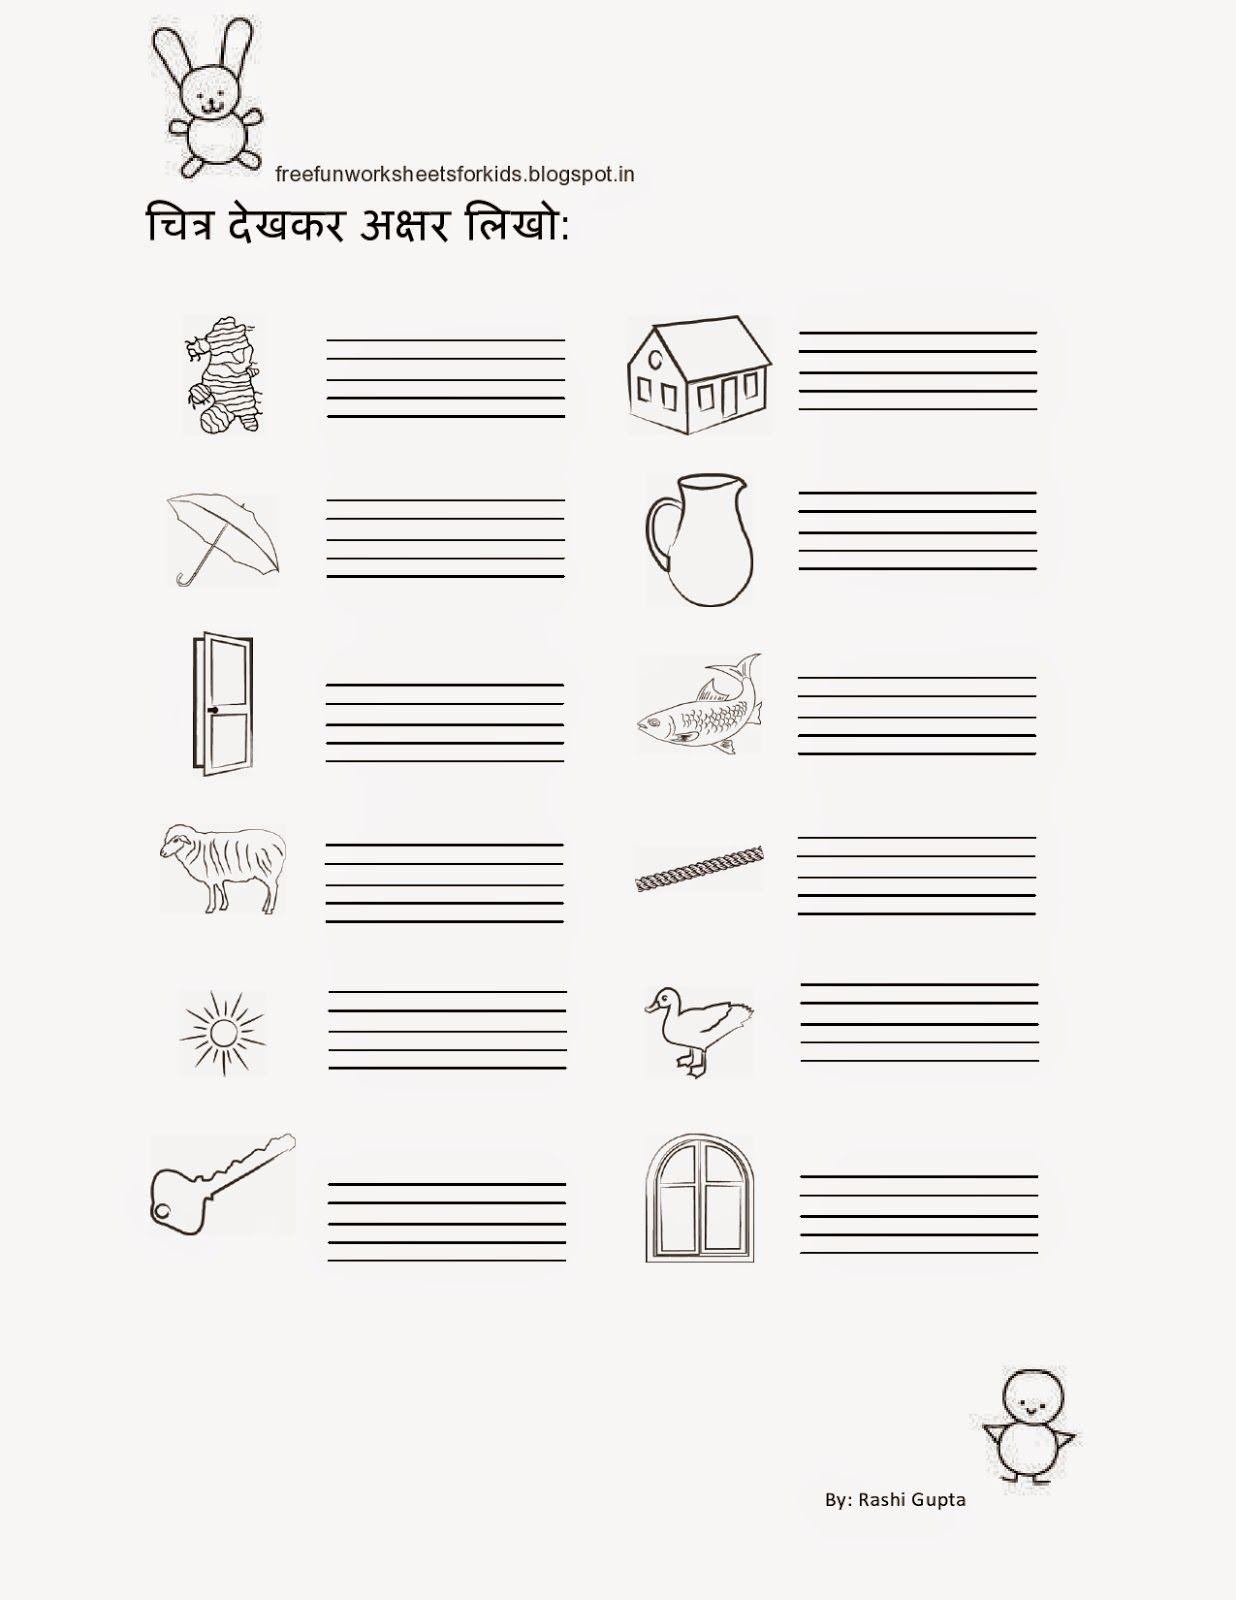 Free Fun Worksheets For Kids: Free Printable Fun Hindi Worksheets ...